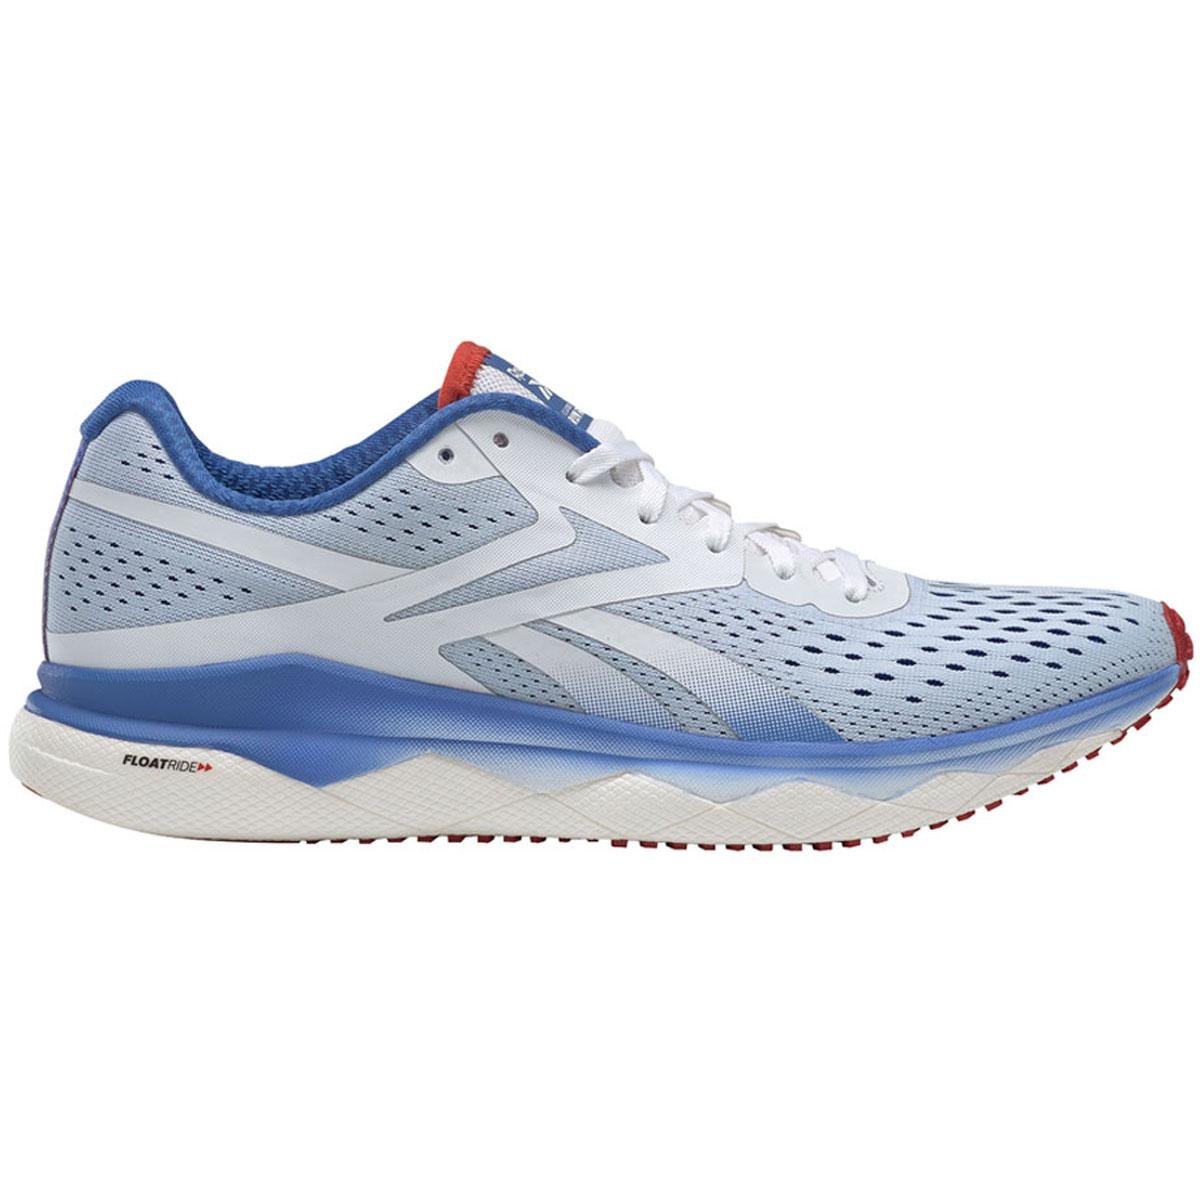 Men's Reebok Floatride Run Fast 2.0 Running Shoe - Color: White/Blue Blast Legacy Red (Regular Width) - Size: 8.5, White/Blue Blast Legacy Red, large, image 1